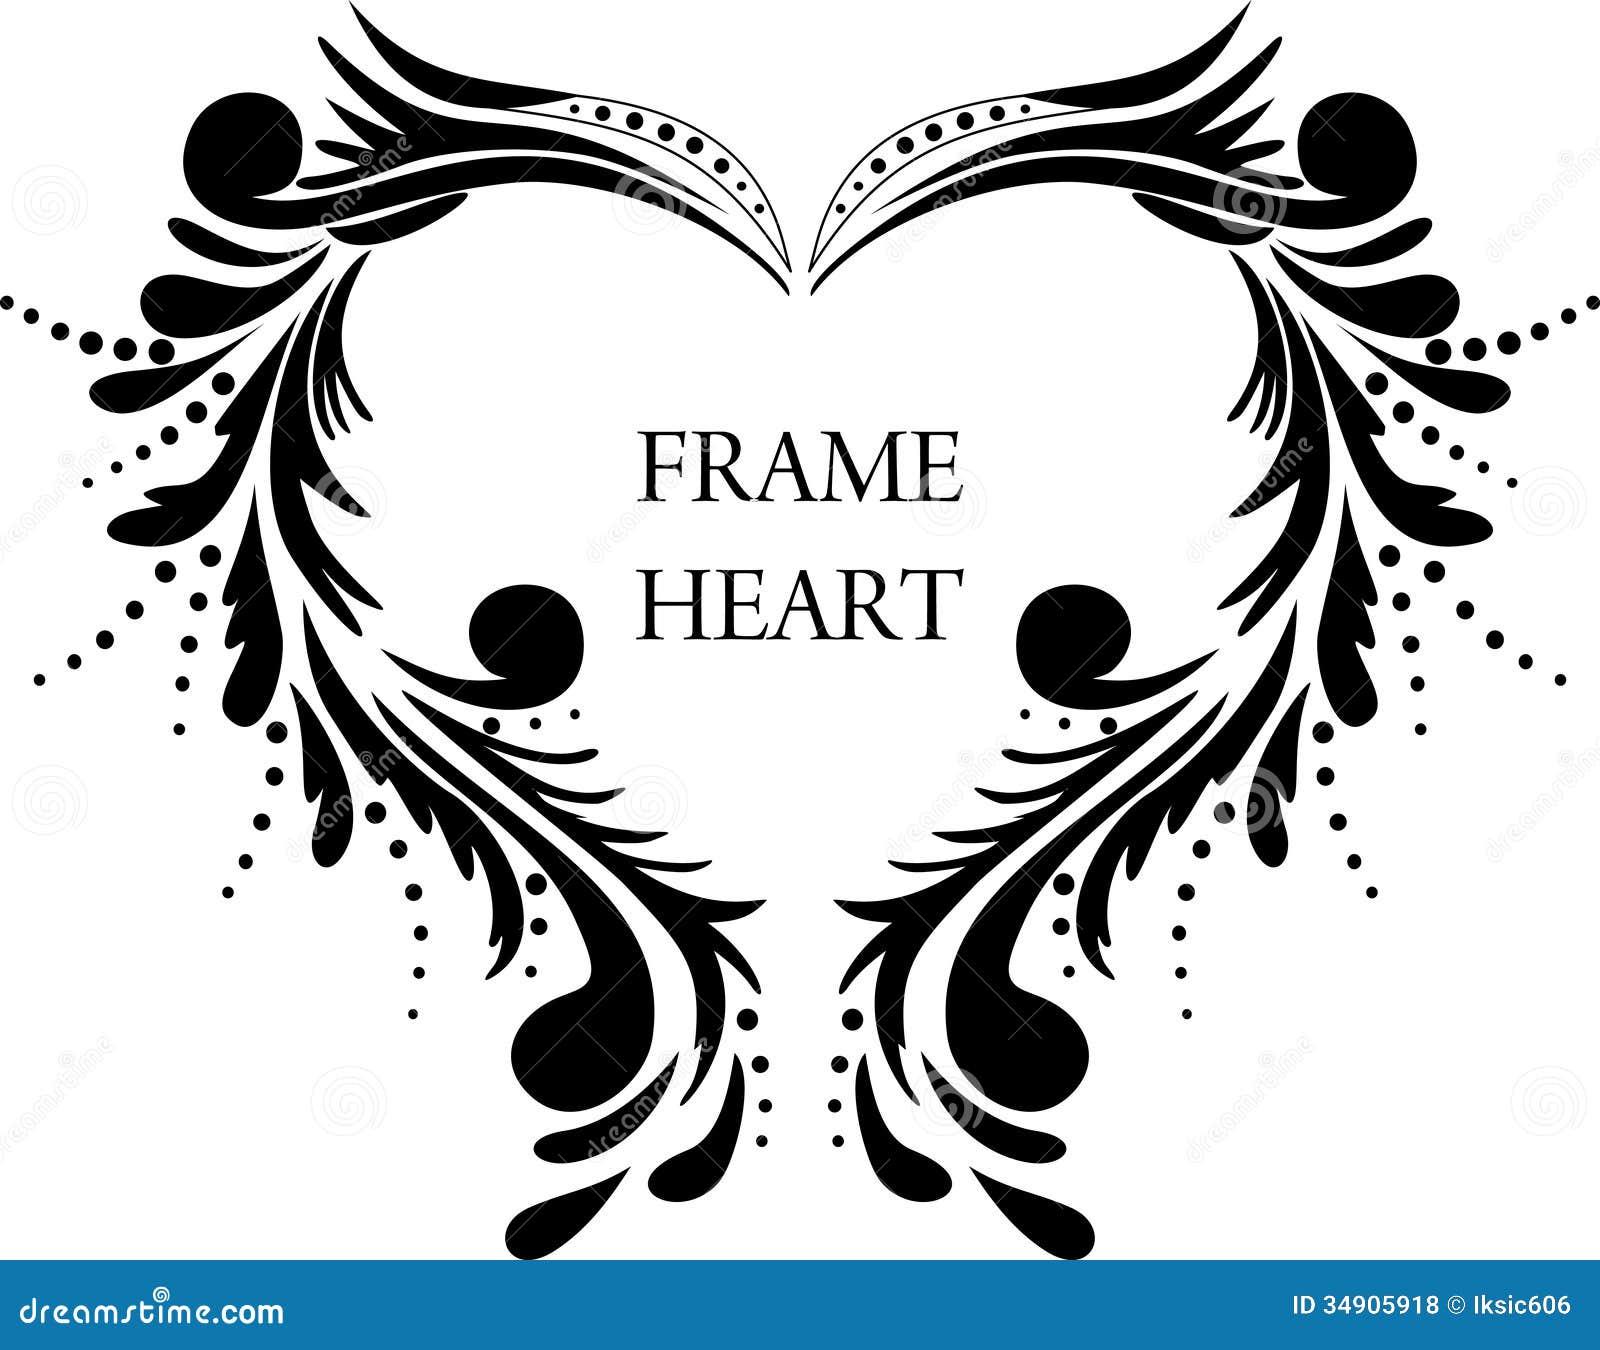 Heart Royalty Free Stock Photos - Image: 34905918